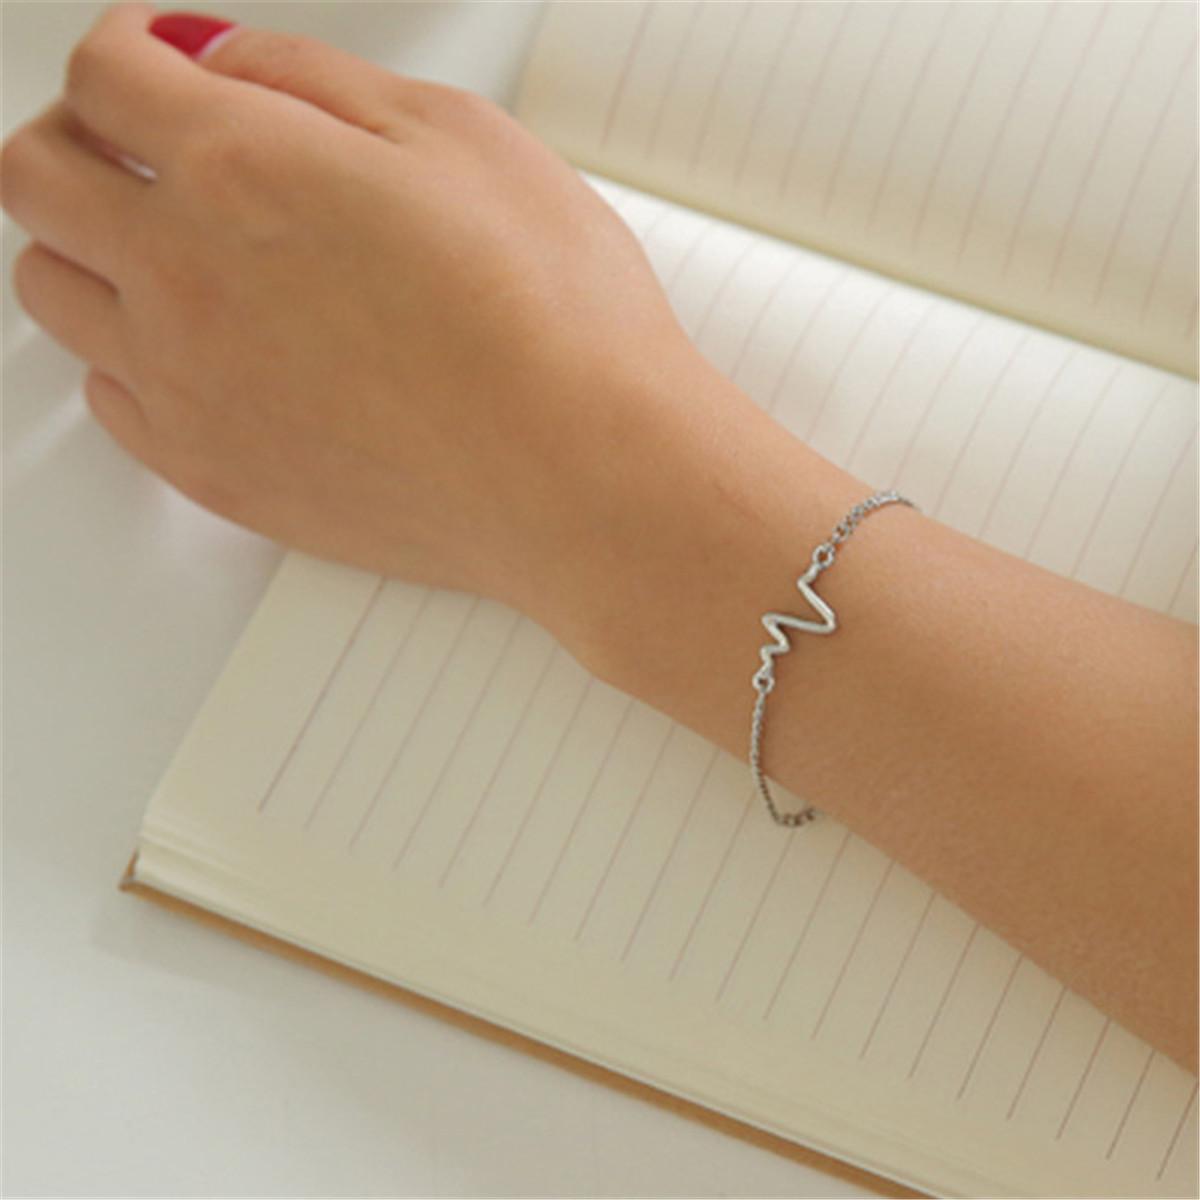 Heartbeat Rhythm Bracelet Anium Steel Ecg Ekg Fashion Bangle